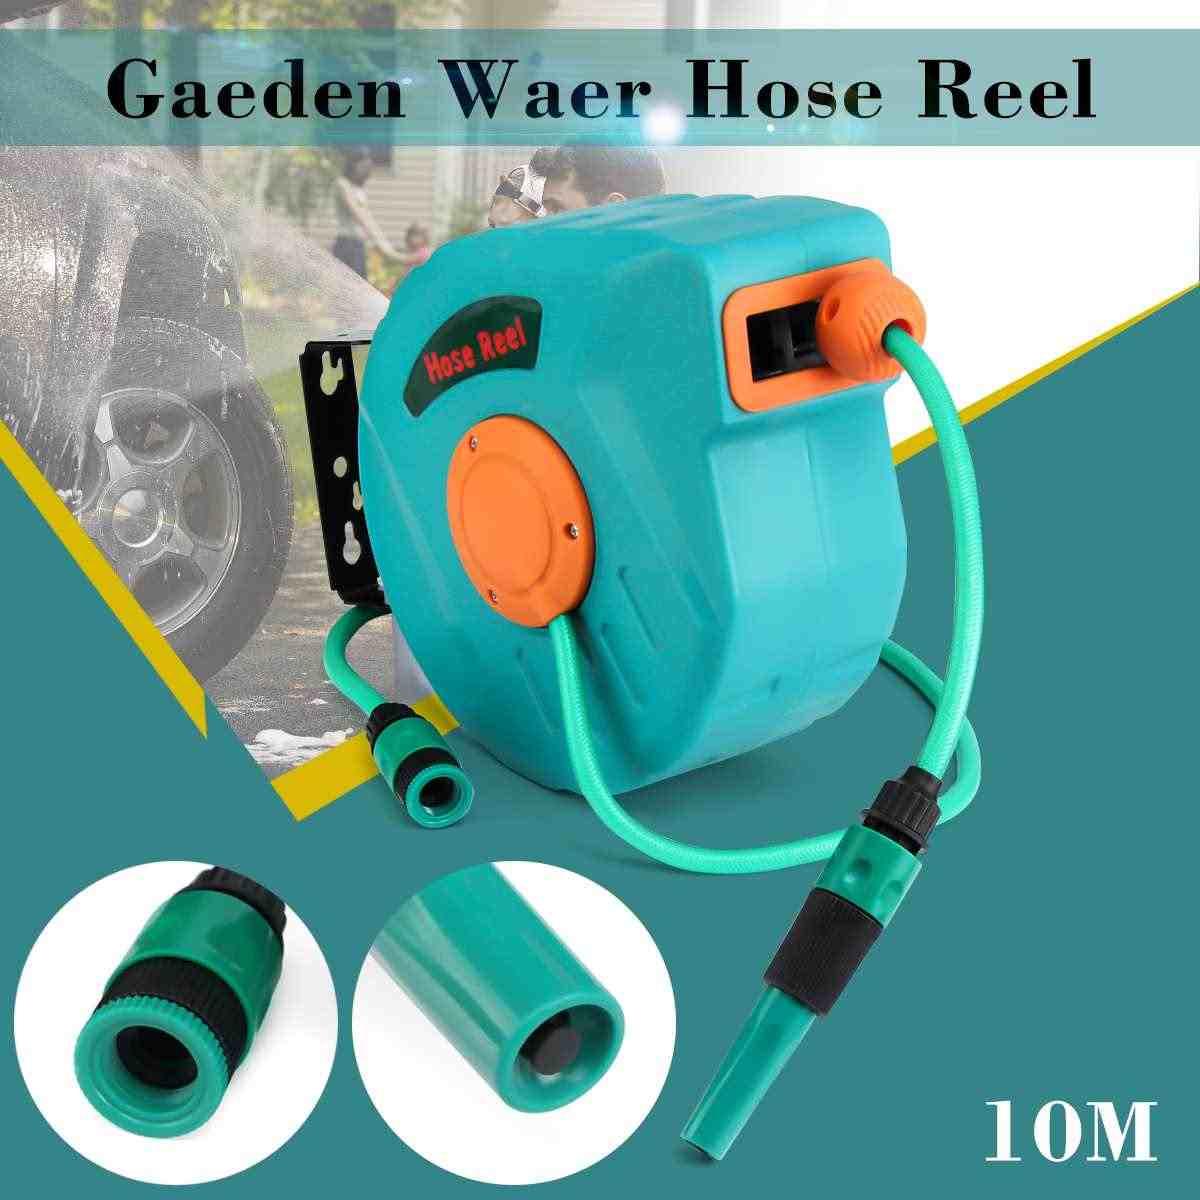 10 M אחורה אוטומטי גן מים סליל צינור נשלף סליל צינור אחסון תרסיס כלי אוניברסלי רכב מכונת כביסה גמיש גן אוויר צינור